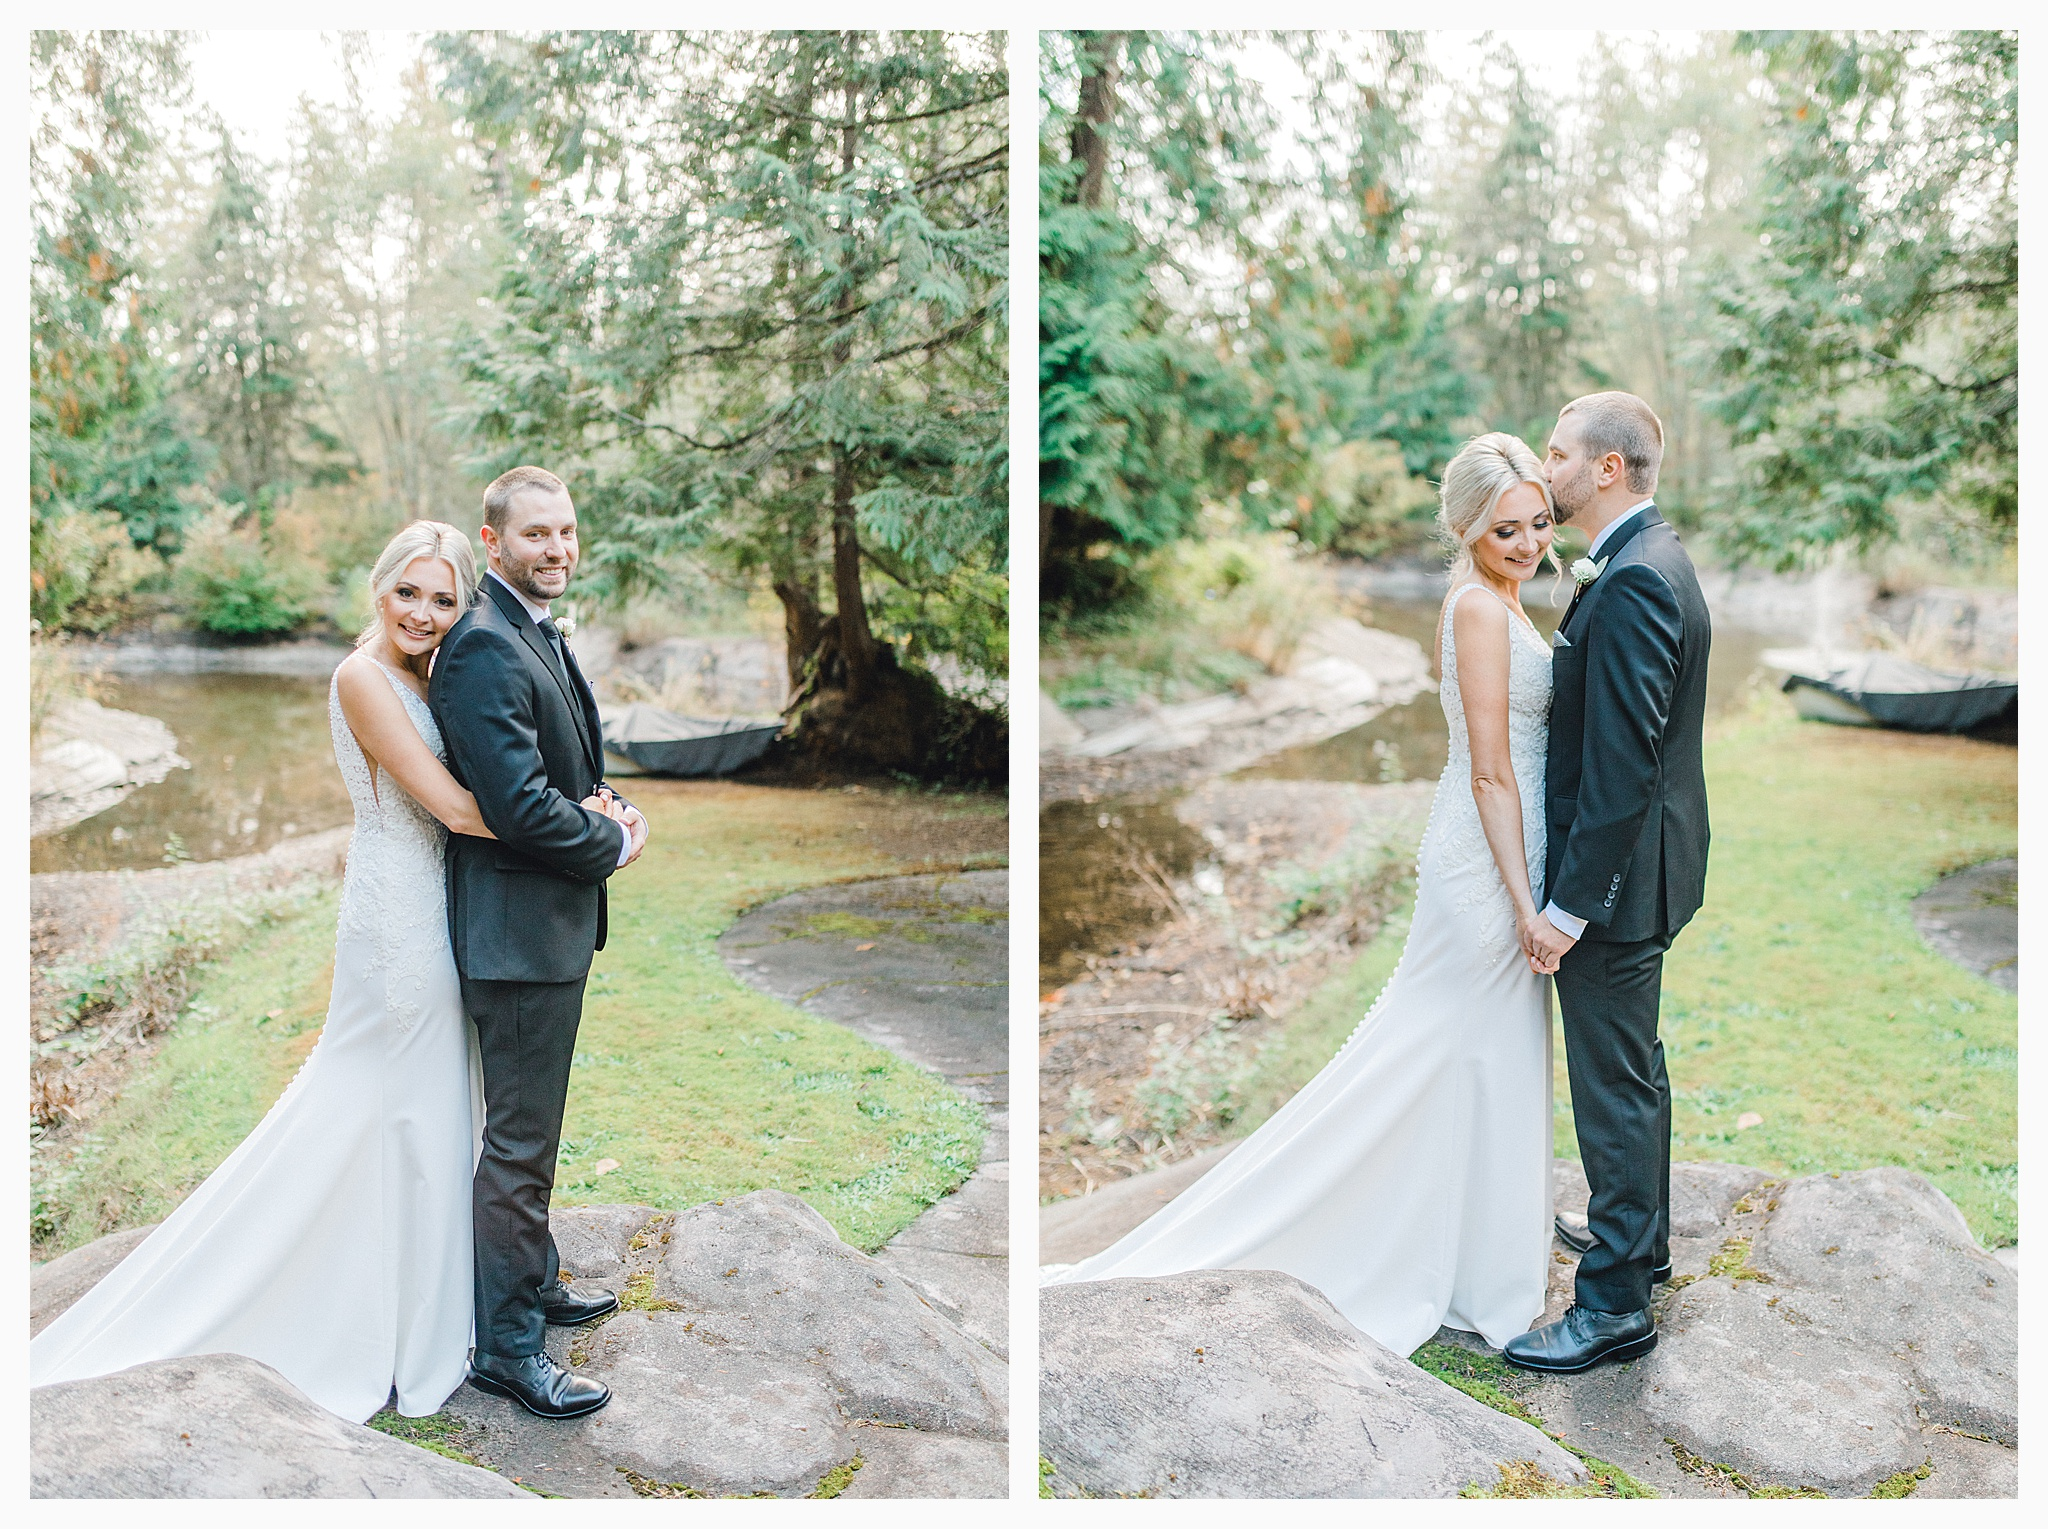 Emma Rose Company Light and Airy Wedding Photographer, Beautiful fall wedding at Rock Creek Gardens Venue in Puyallup, Washington._0038.jpg